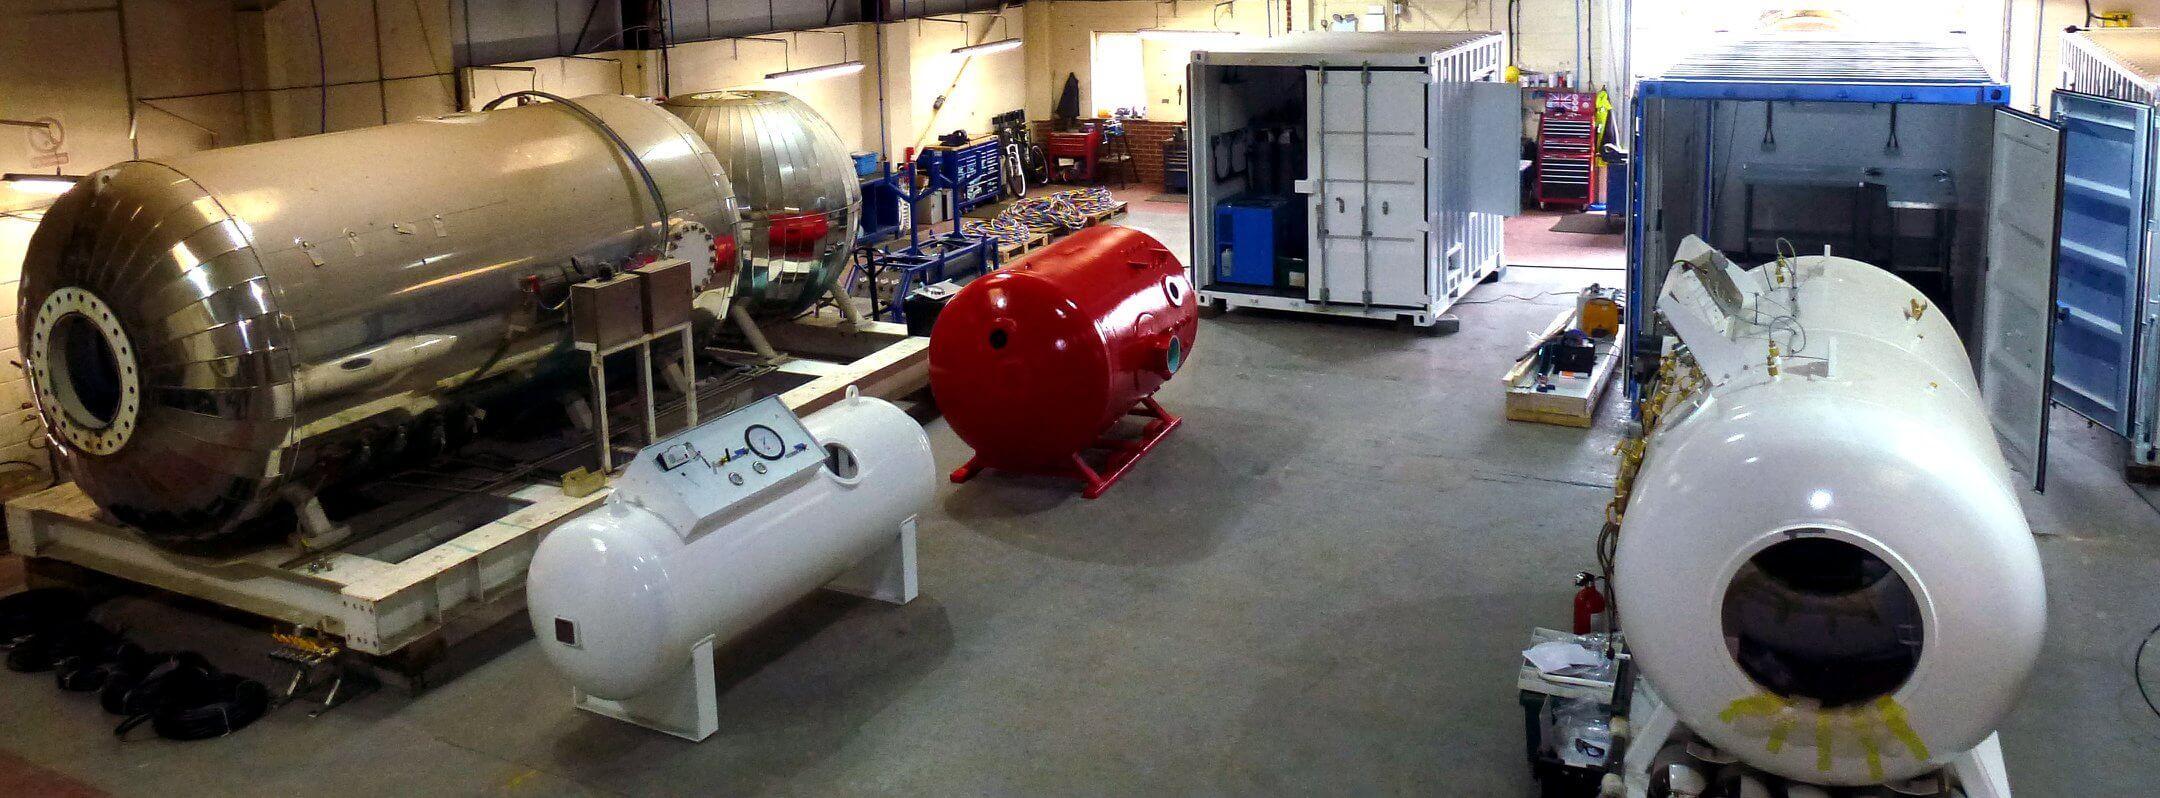 decompression chambers